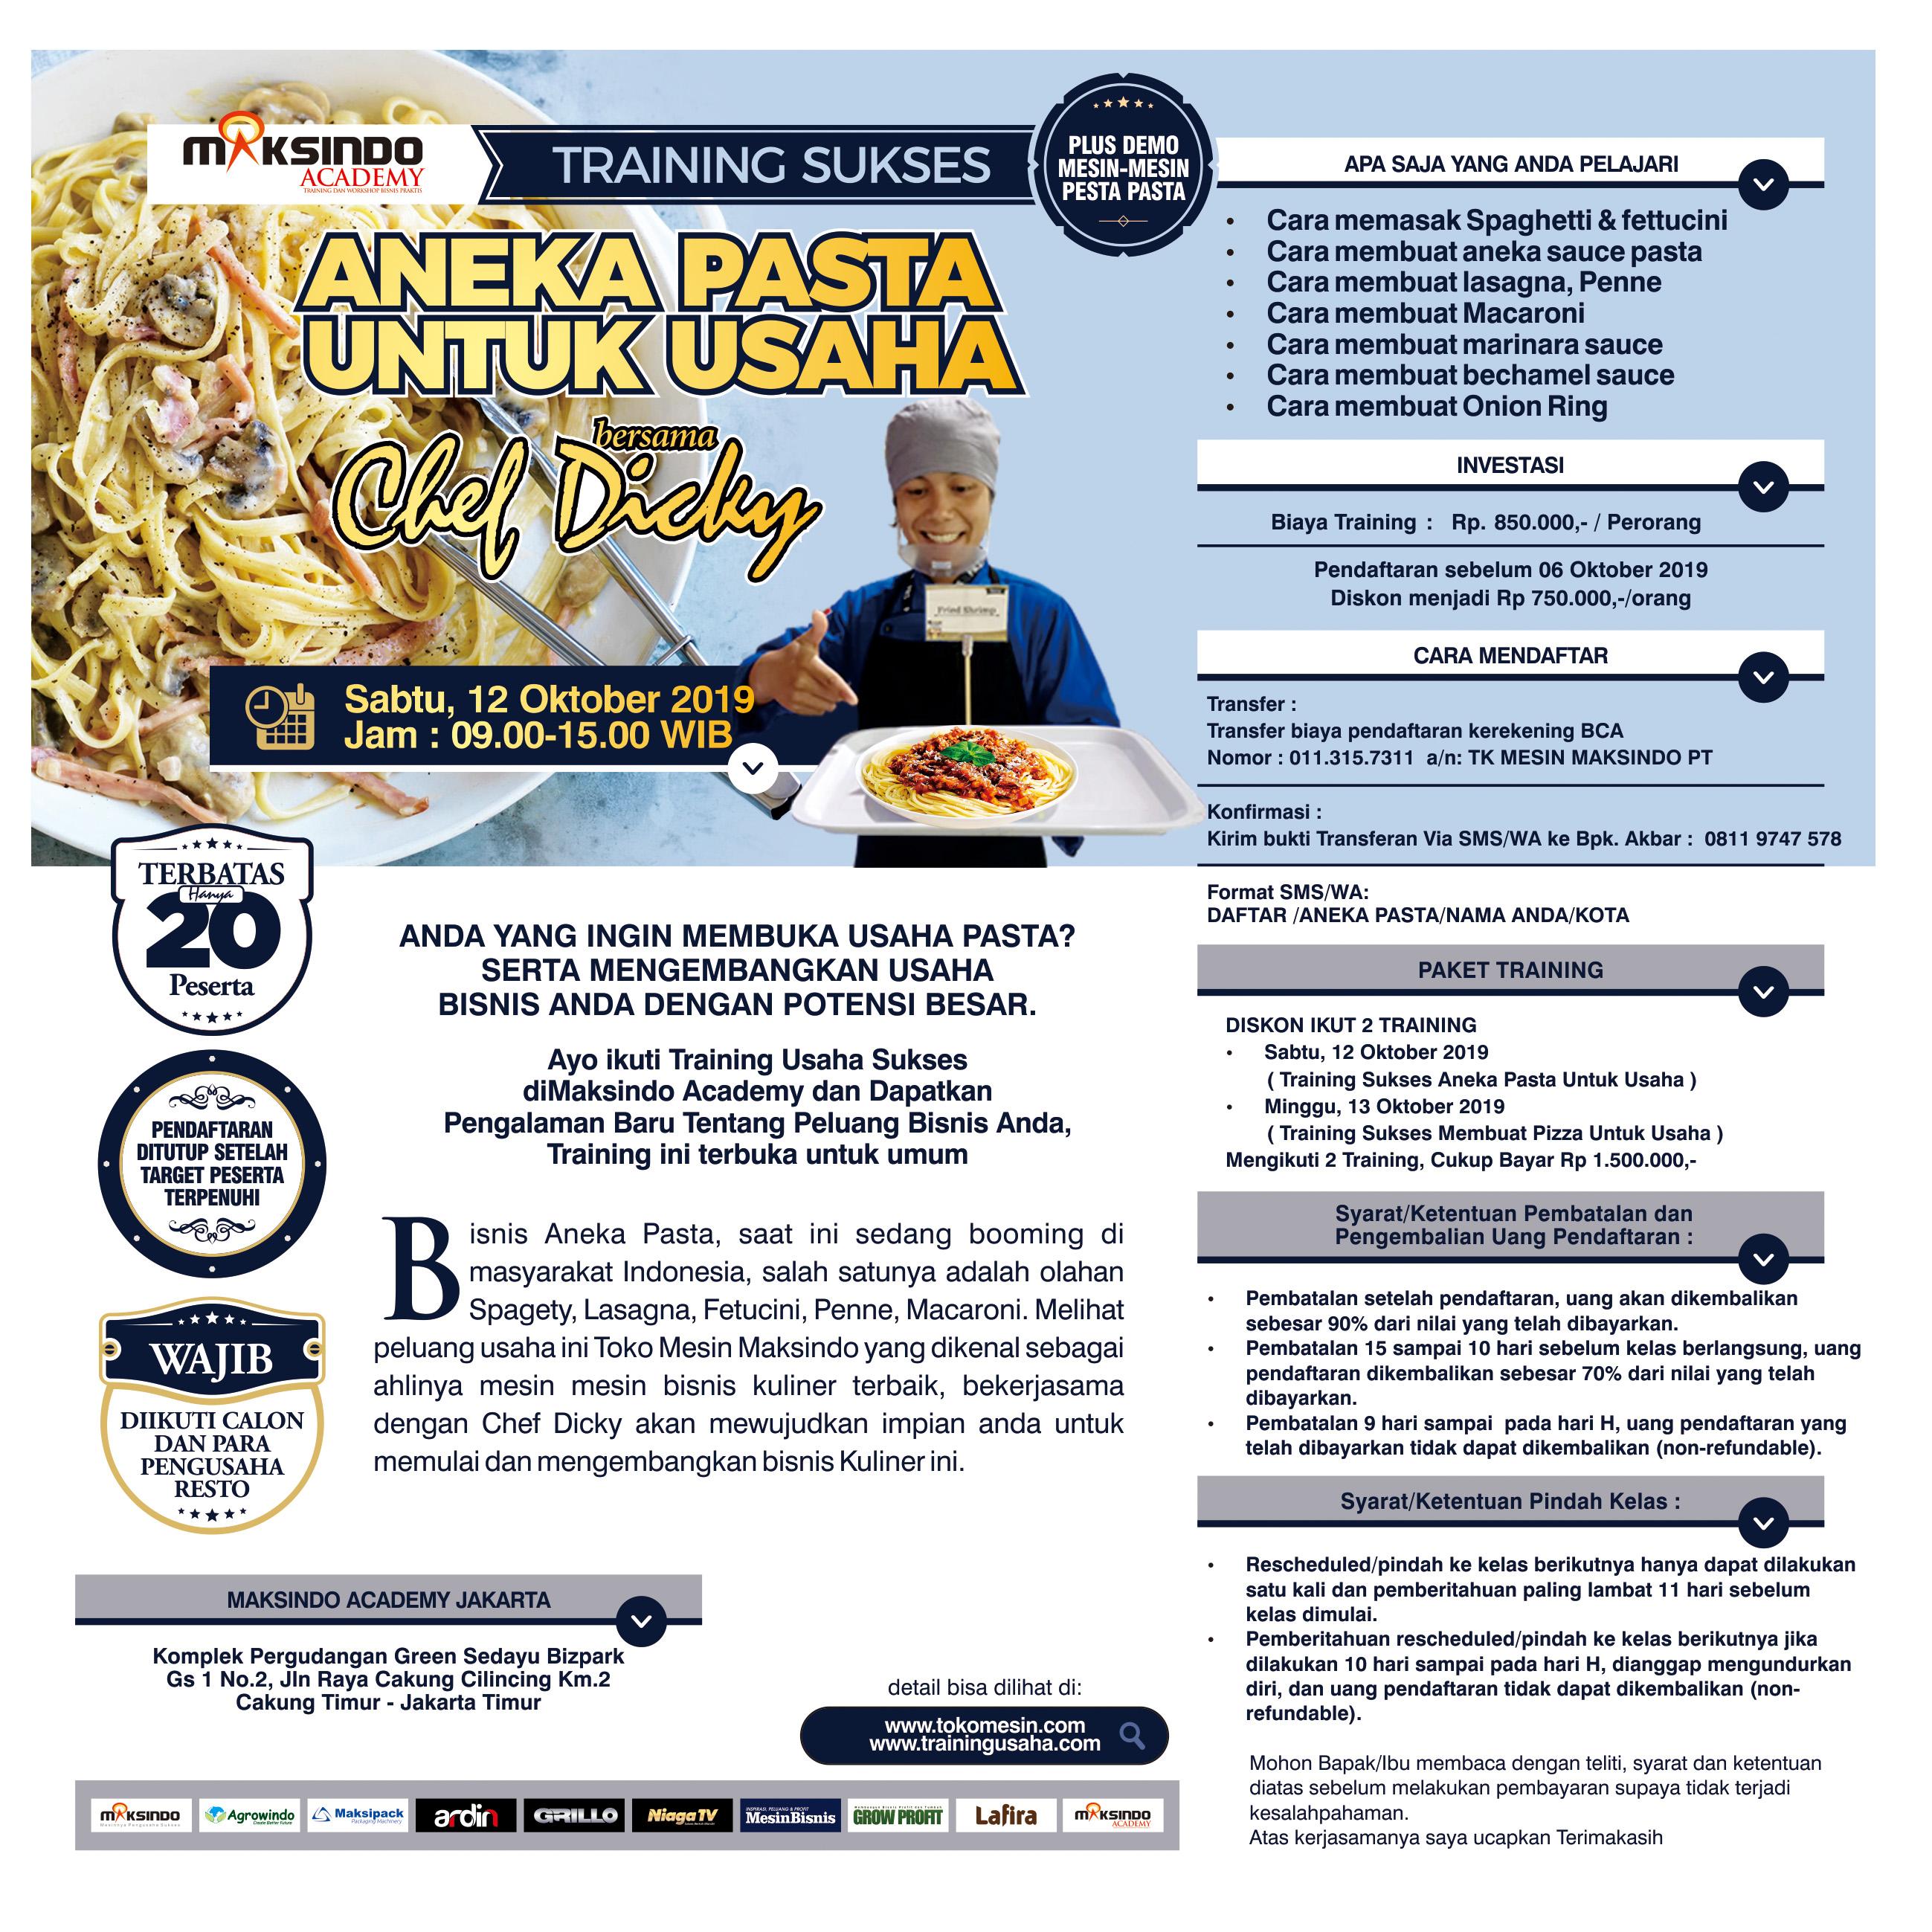 Training Sukses Aneka Pasta Untuk Usaha, Sabtu 12 Oktober 2019